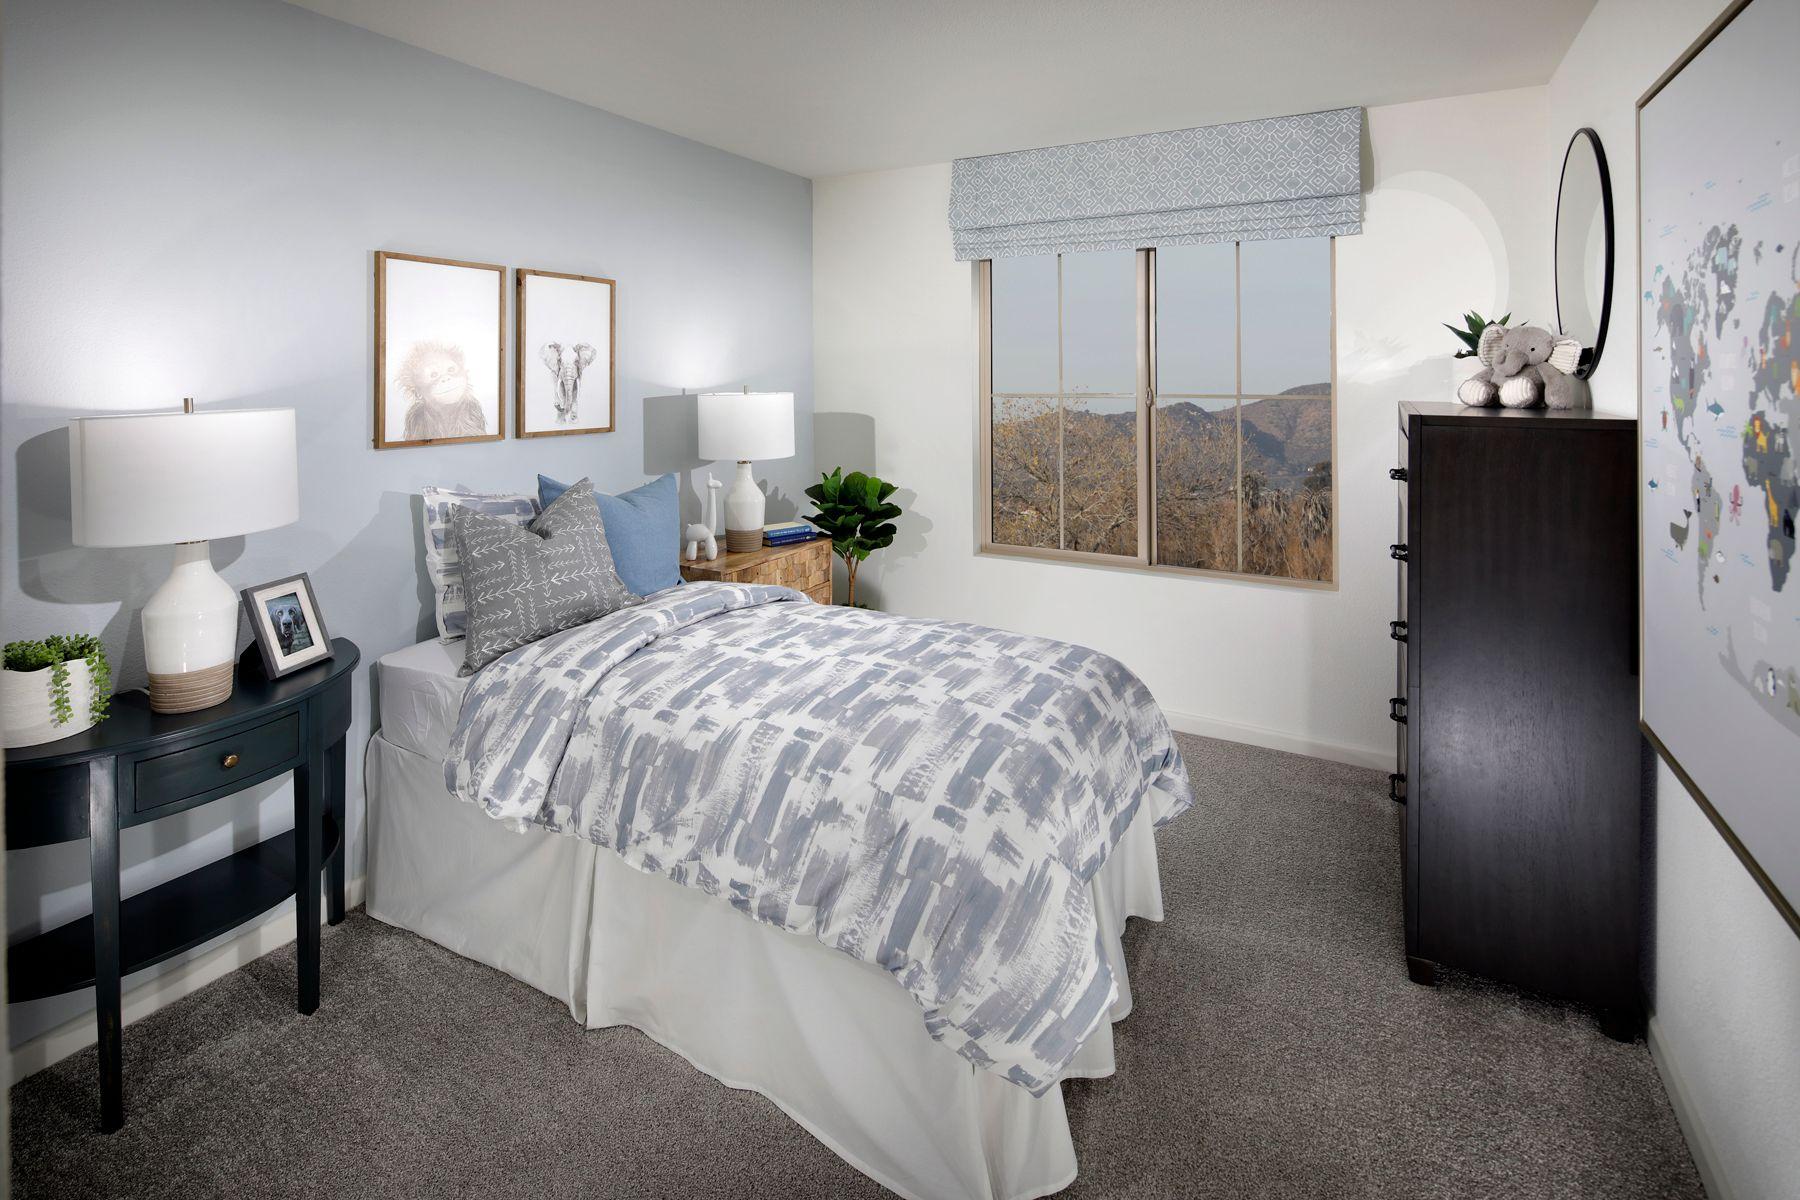 Bedroom featured in the Towns Plan 2 By Century Communities in Riverside-San Bernardino, CA